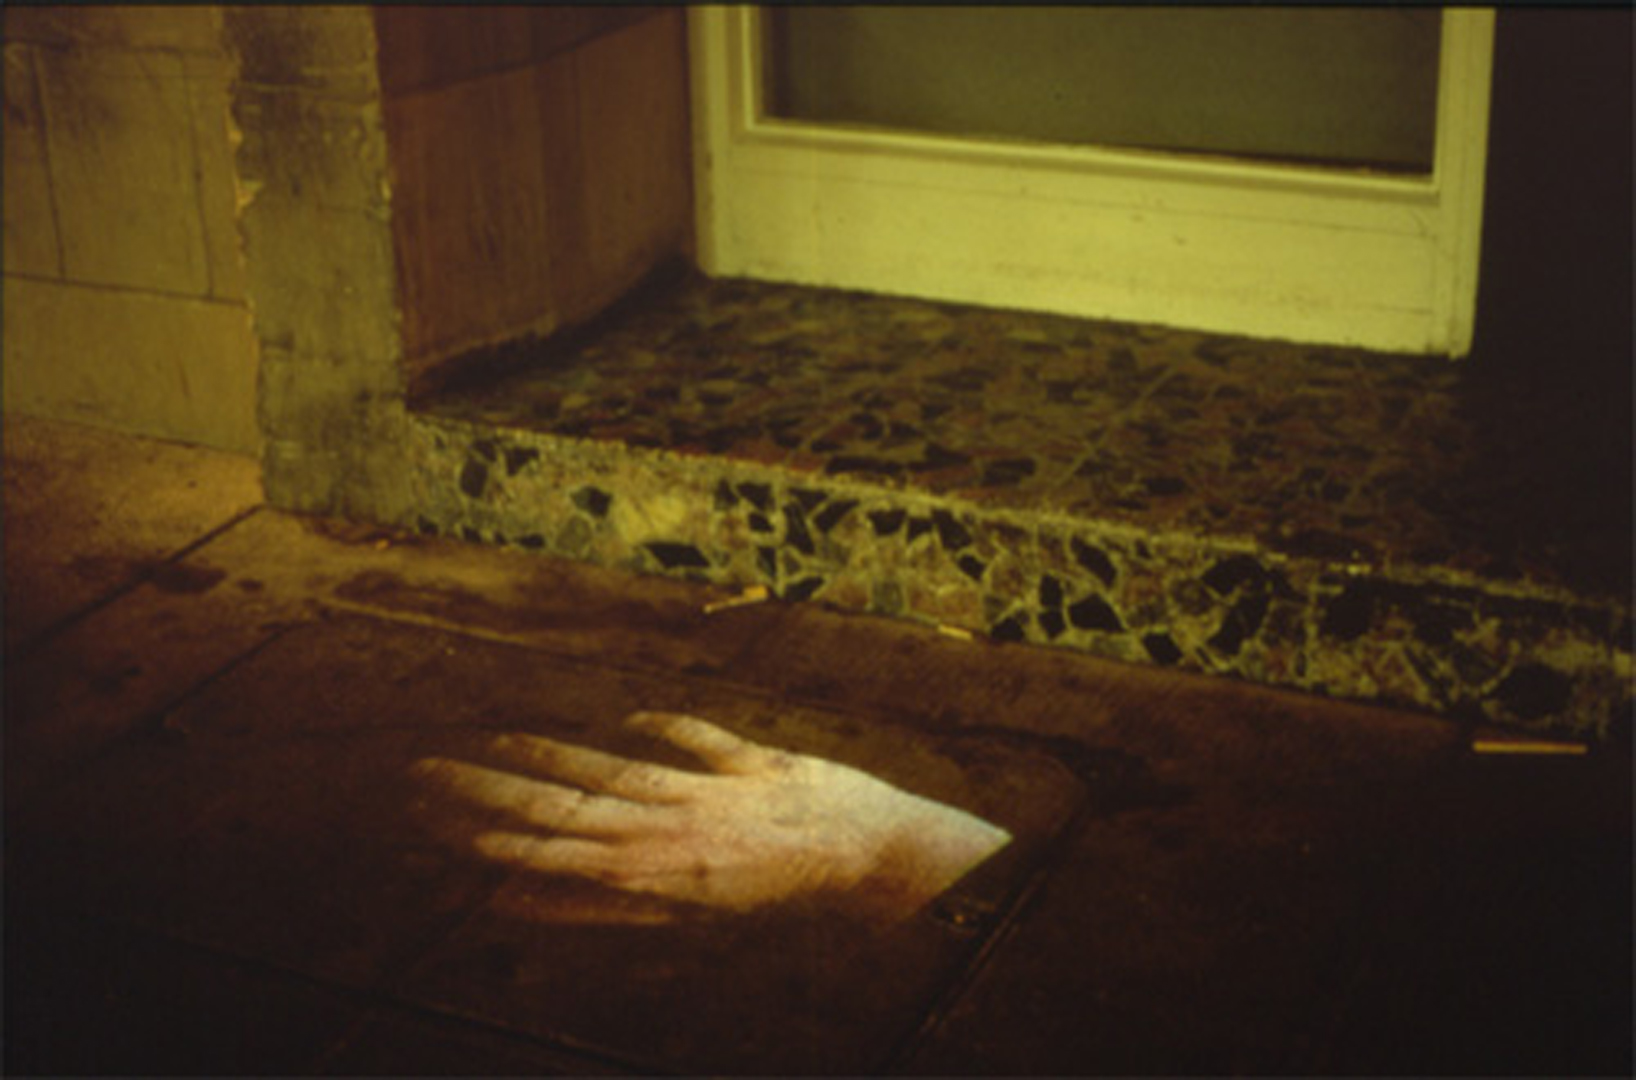 ©ISEA97: Eighth International Symposium on Electronic Art, Susan Alexis Collins, Public vs Public: The Pedestrian Gesture